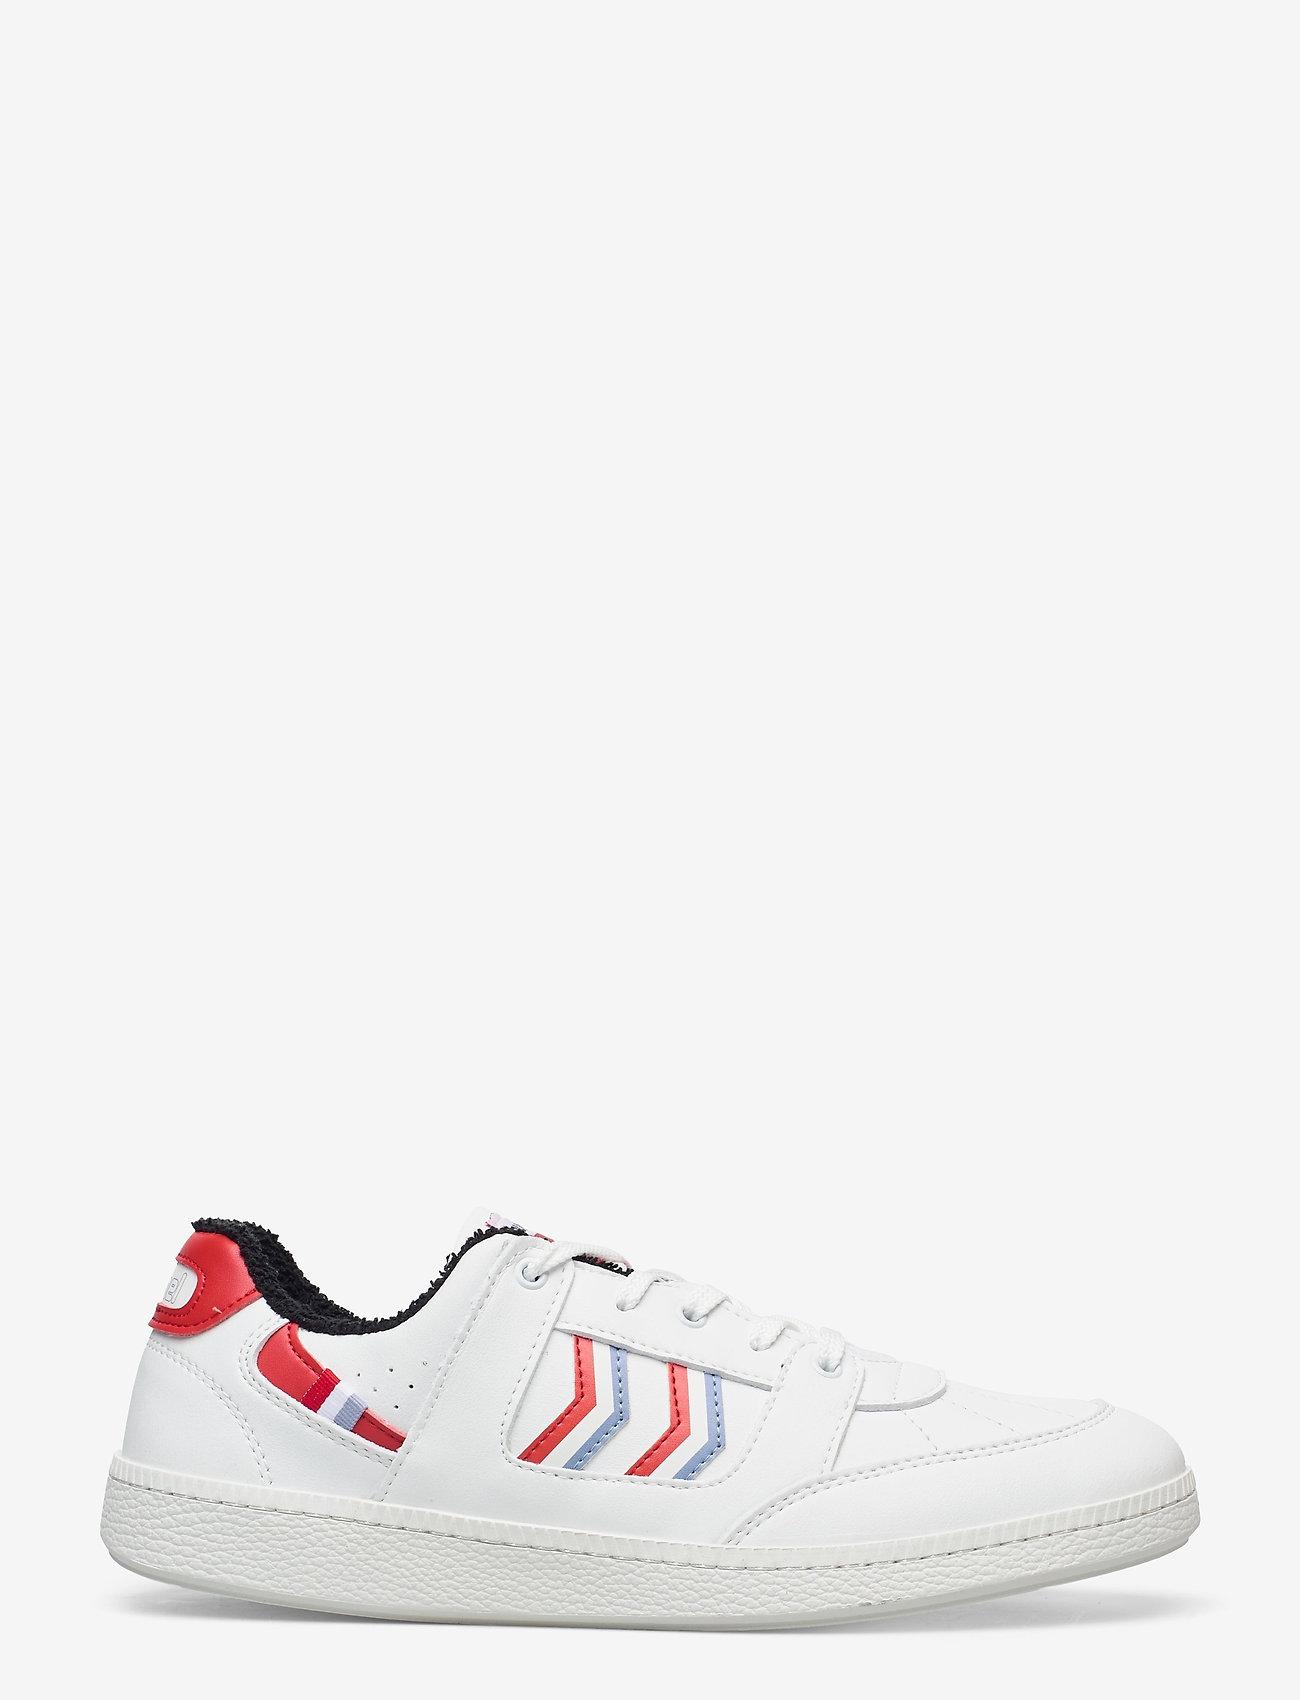 Hummel - SEOUL VEGAN ARCHIVE - laag sneakers - white/fiery red - 0